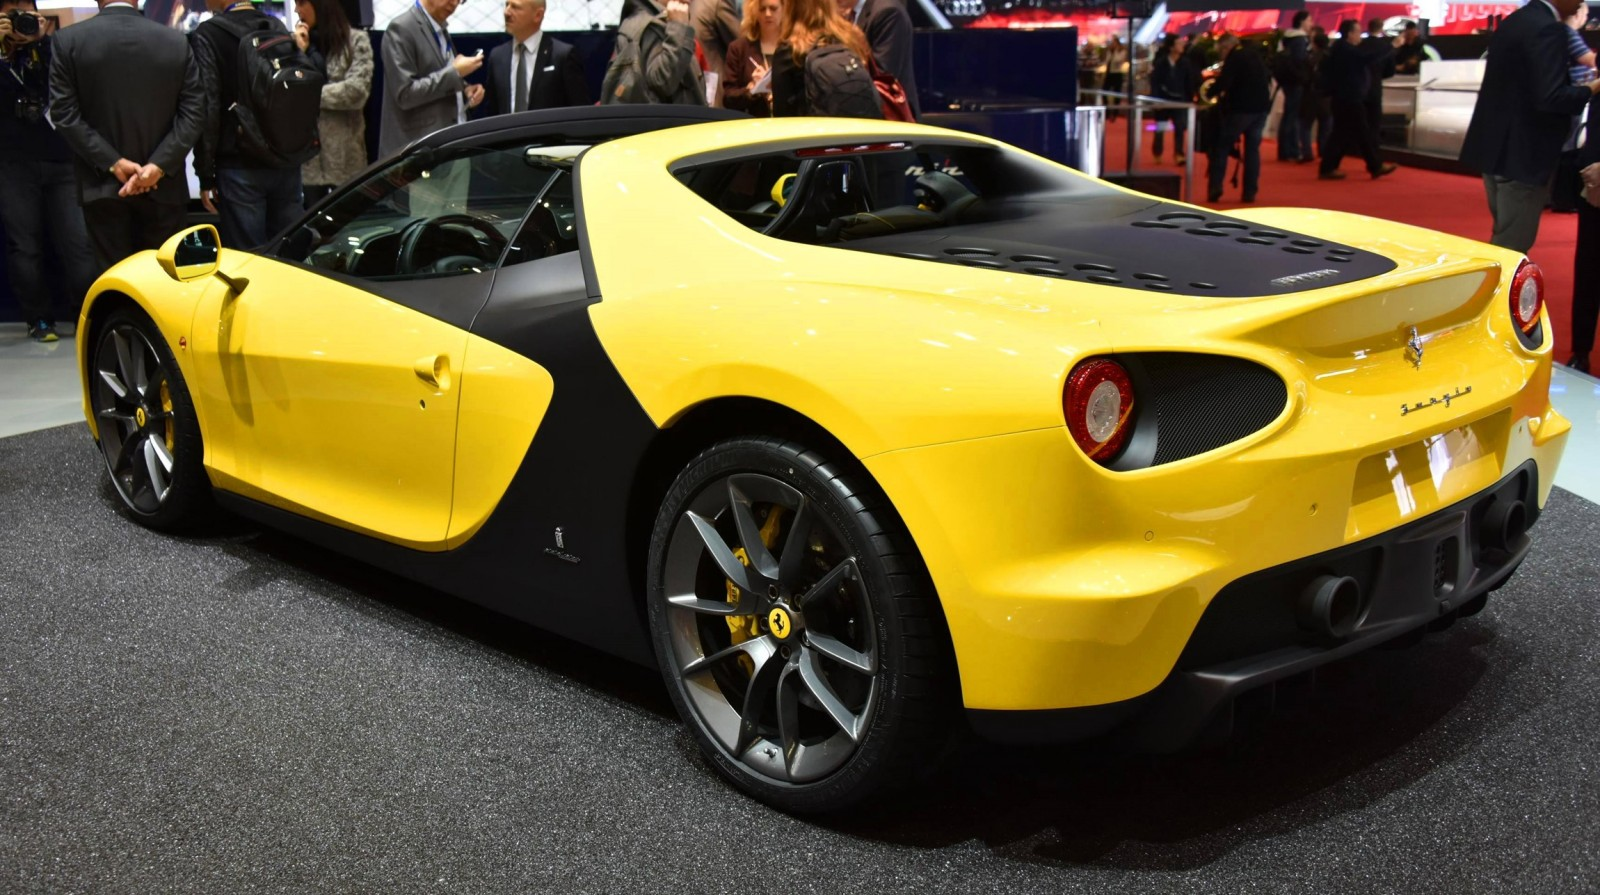 Geneva 2015 Gallery - 2015 Ferrari Sergio by Pininfarina  7